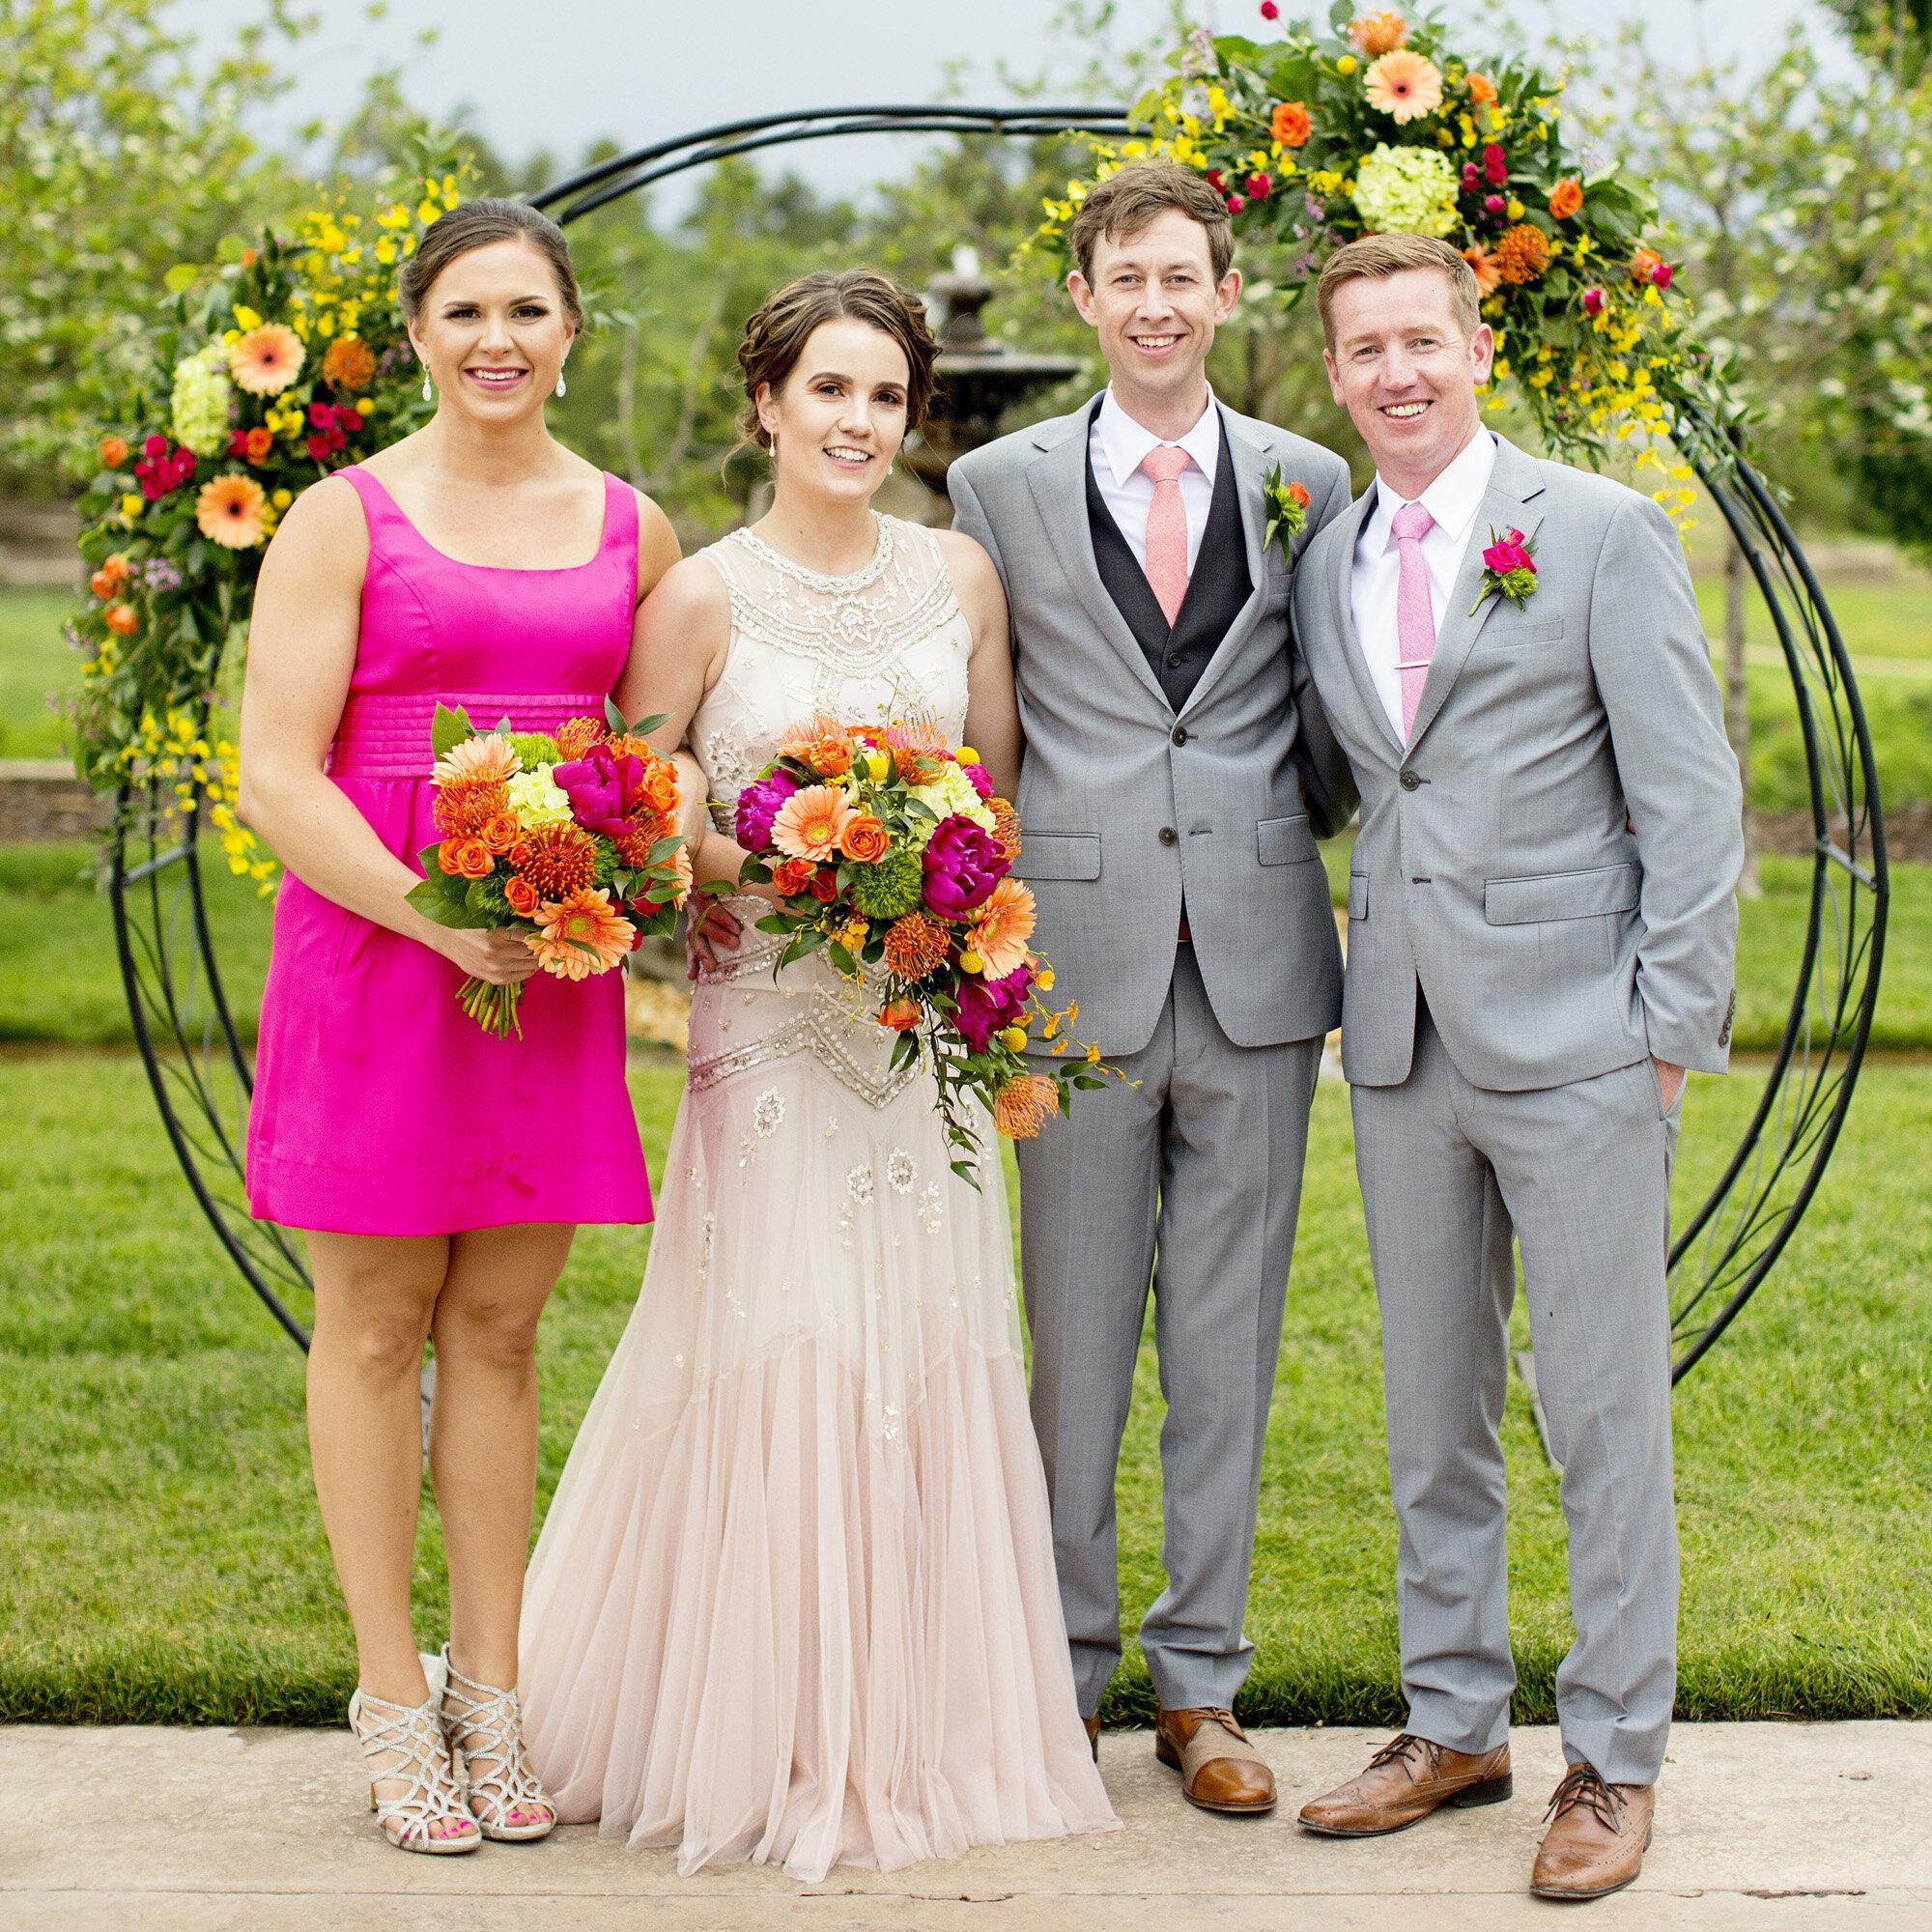 Seriously_Sabrina_Photography_Colorado_Springs_Club_at_Flying_Horse_Destination_Wedding_ODwyer67.jpg